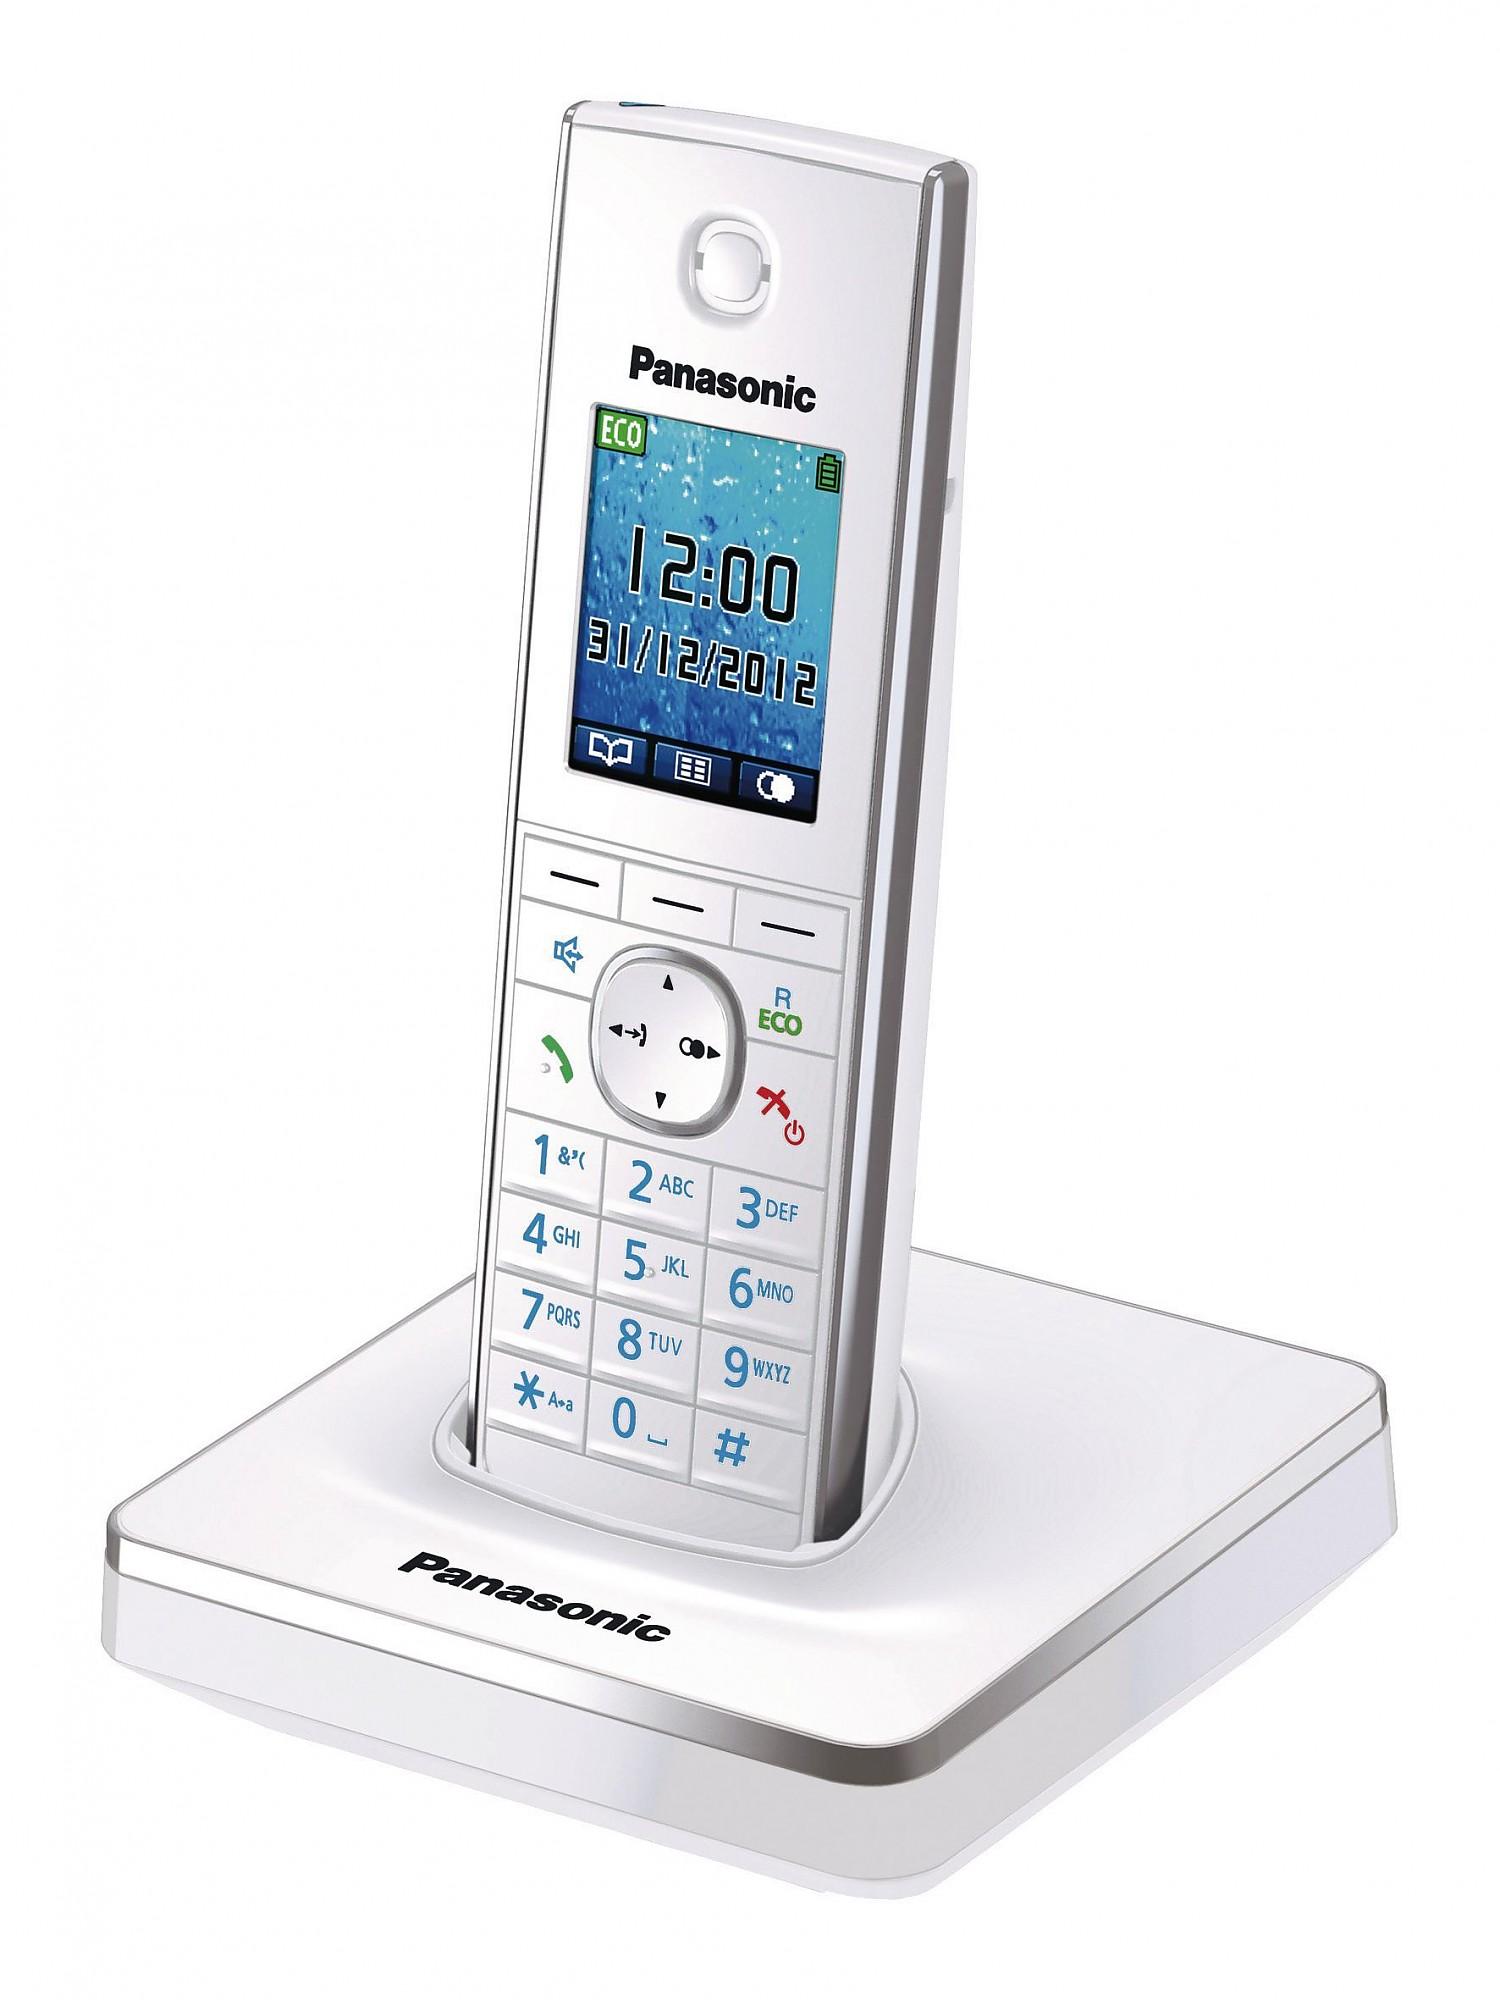 ������������ Panasonic Kx-tg8551ruw